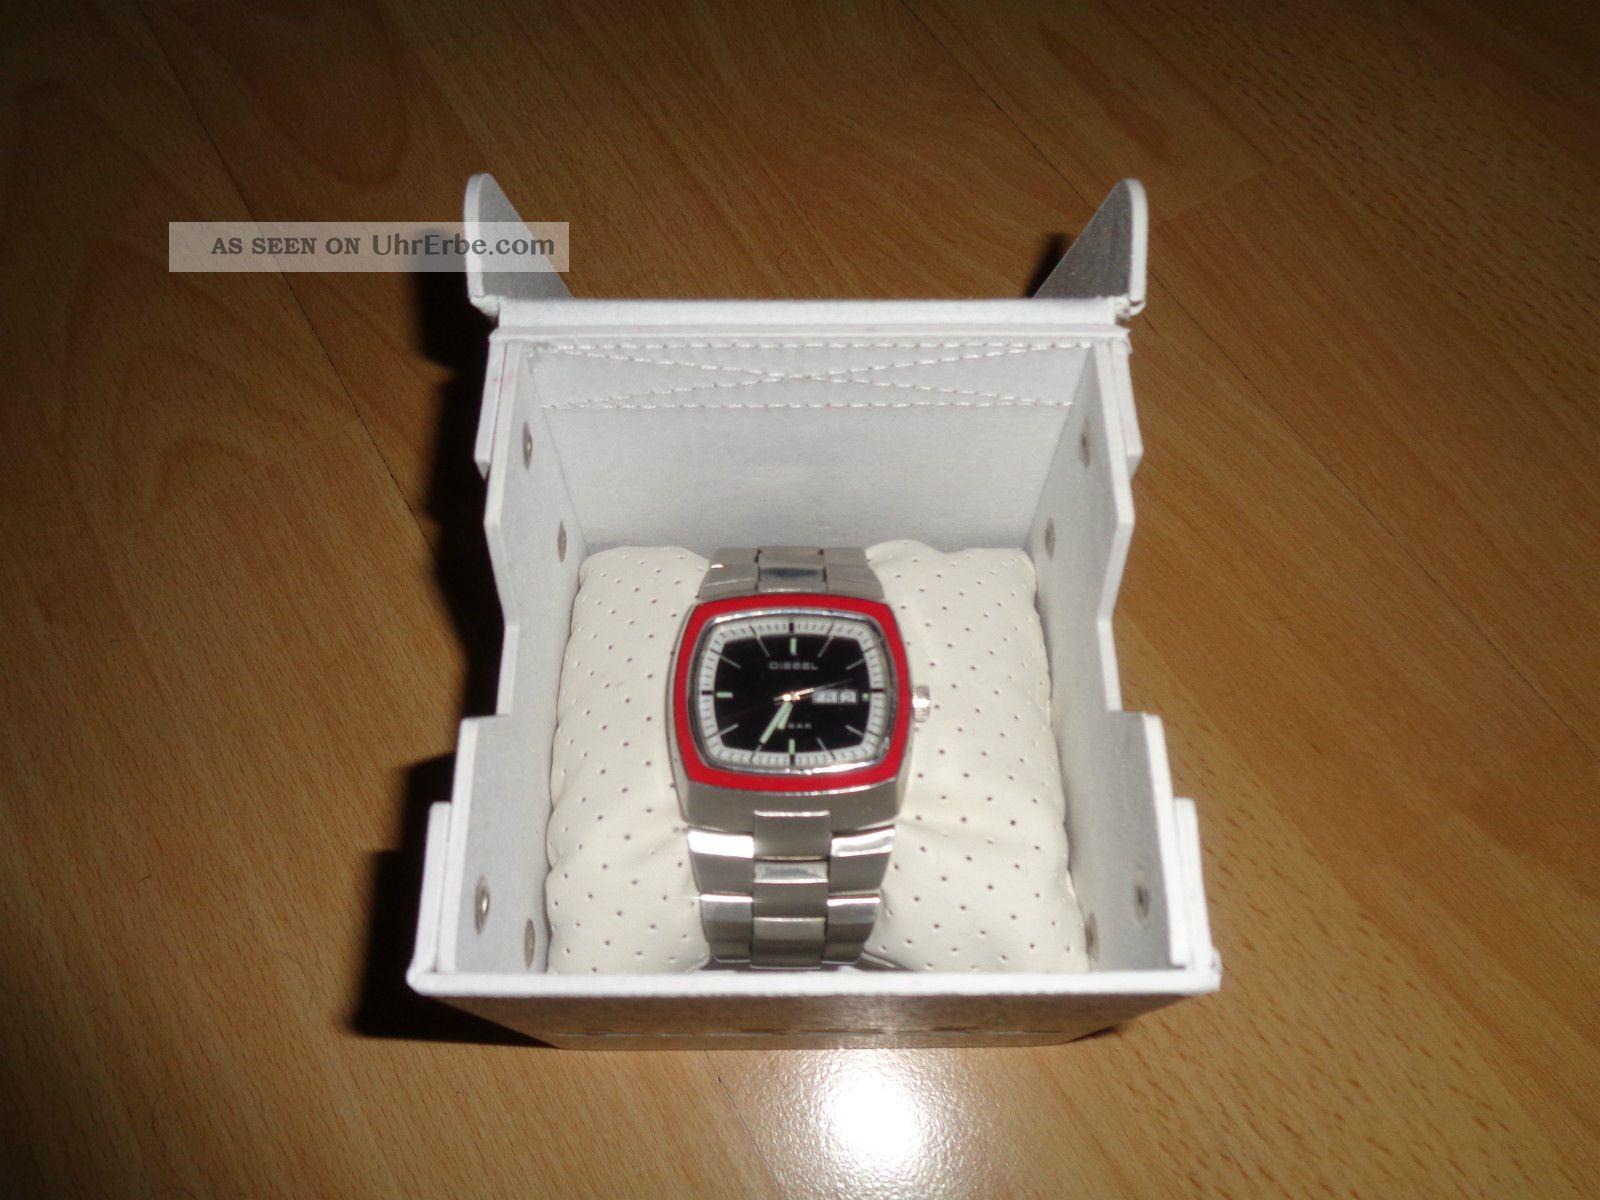 Diesel Herren Analog Armbanduhr Uhr Edelstahl Silber Schwarz Rot Mit Ovp Armbanduhren Bild